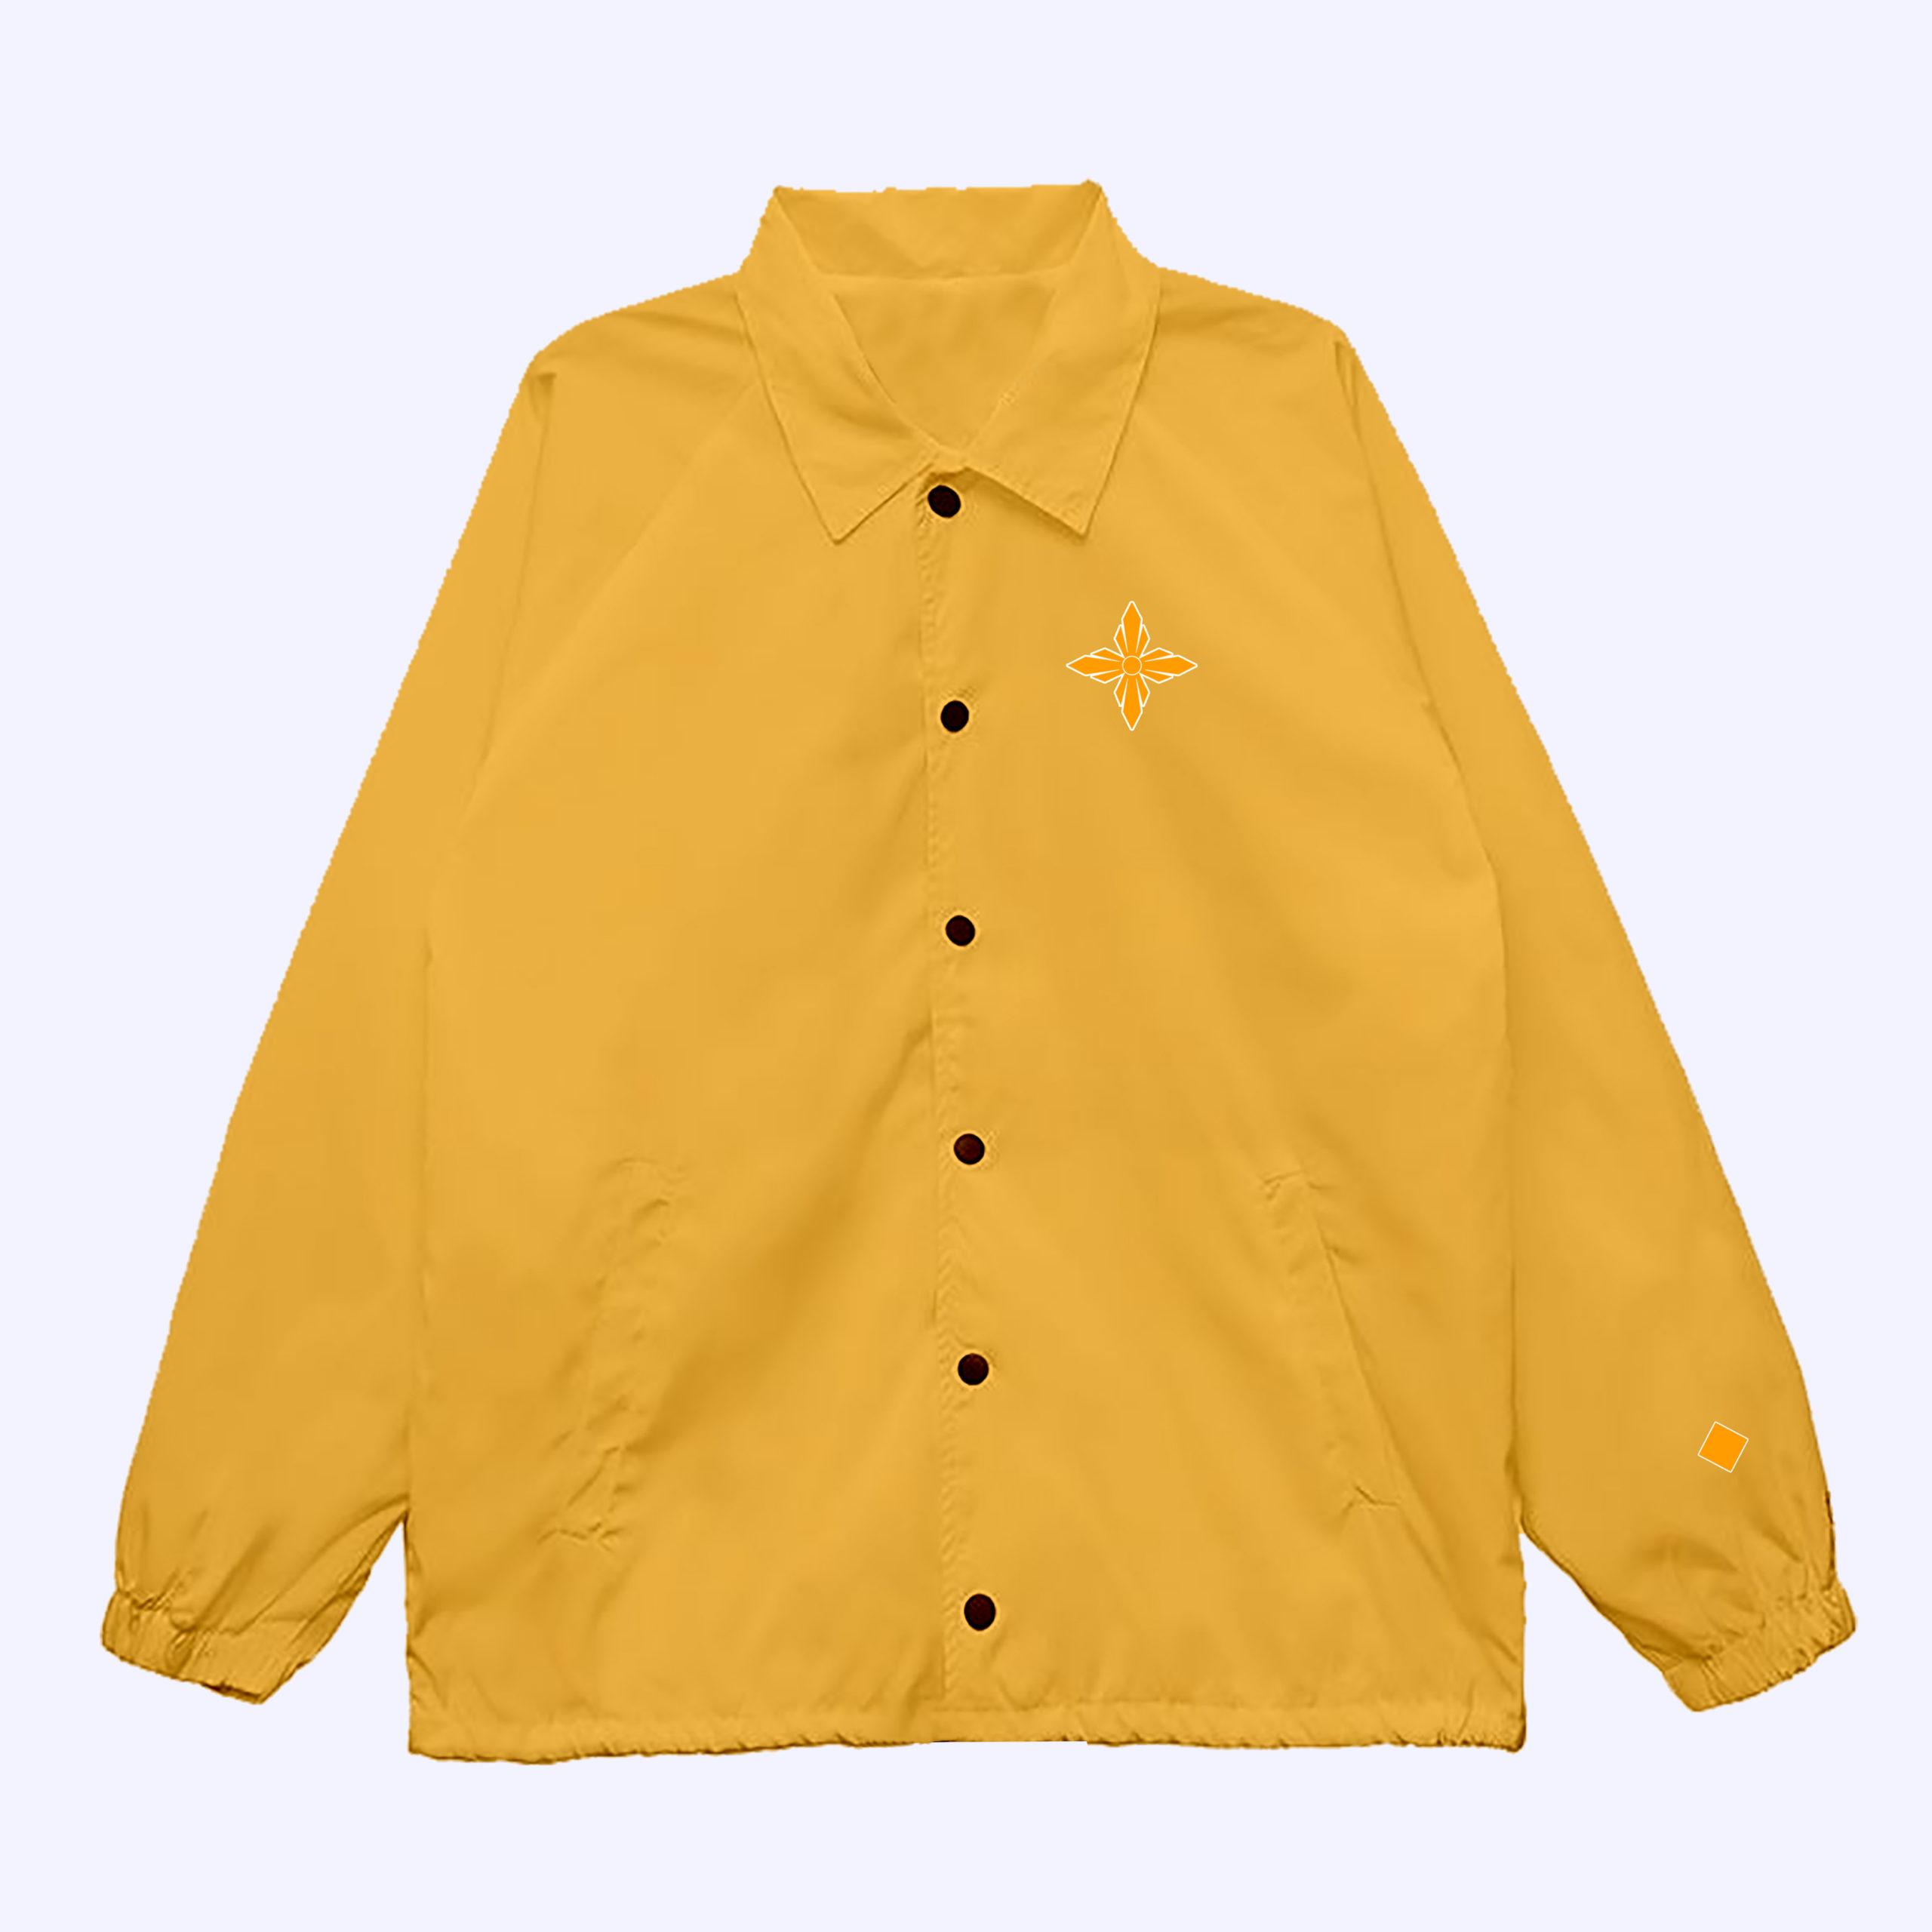 Tangerine Giant Brilliant Coach Jacket